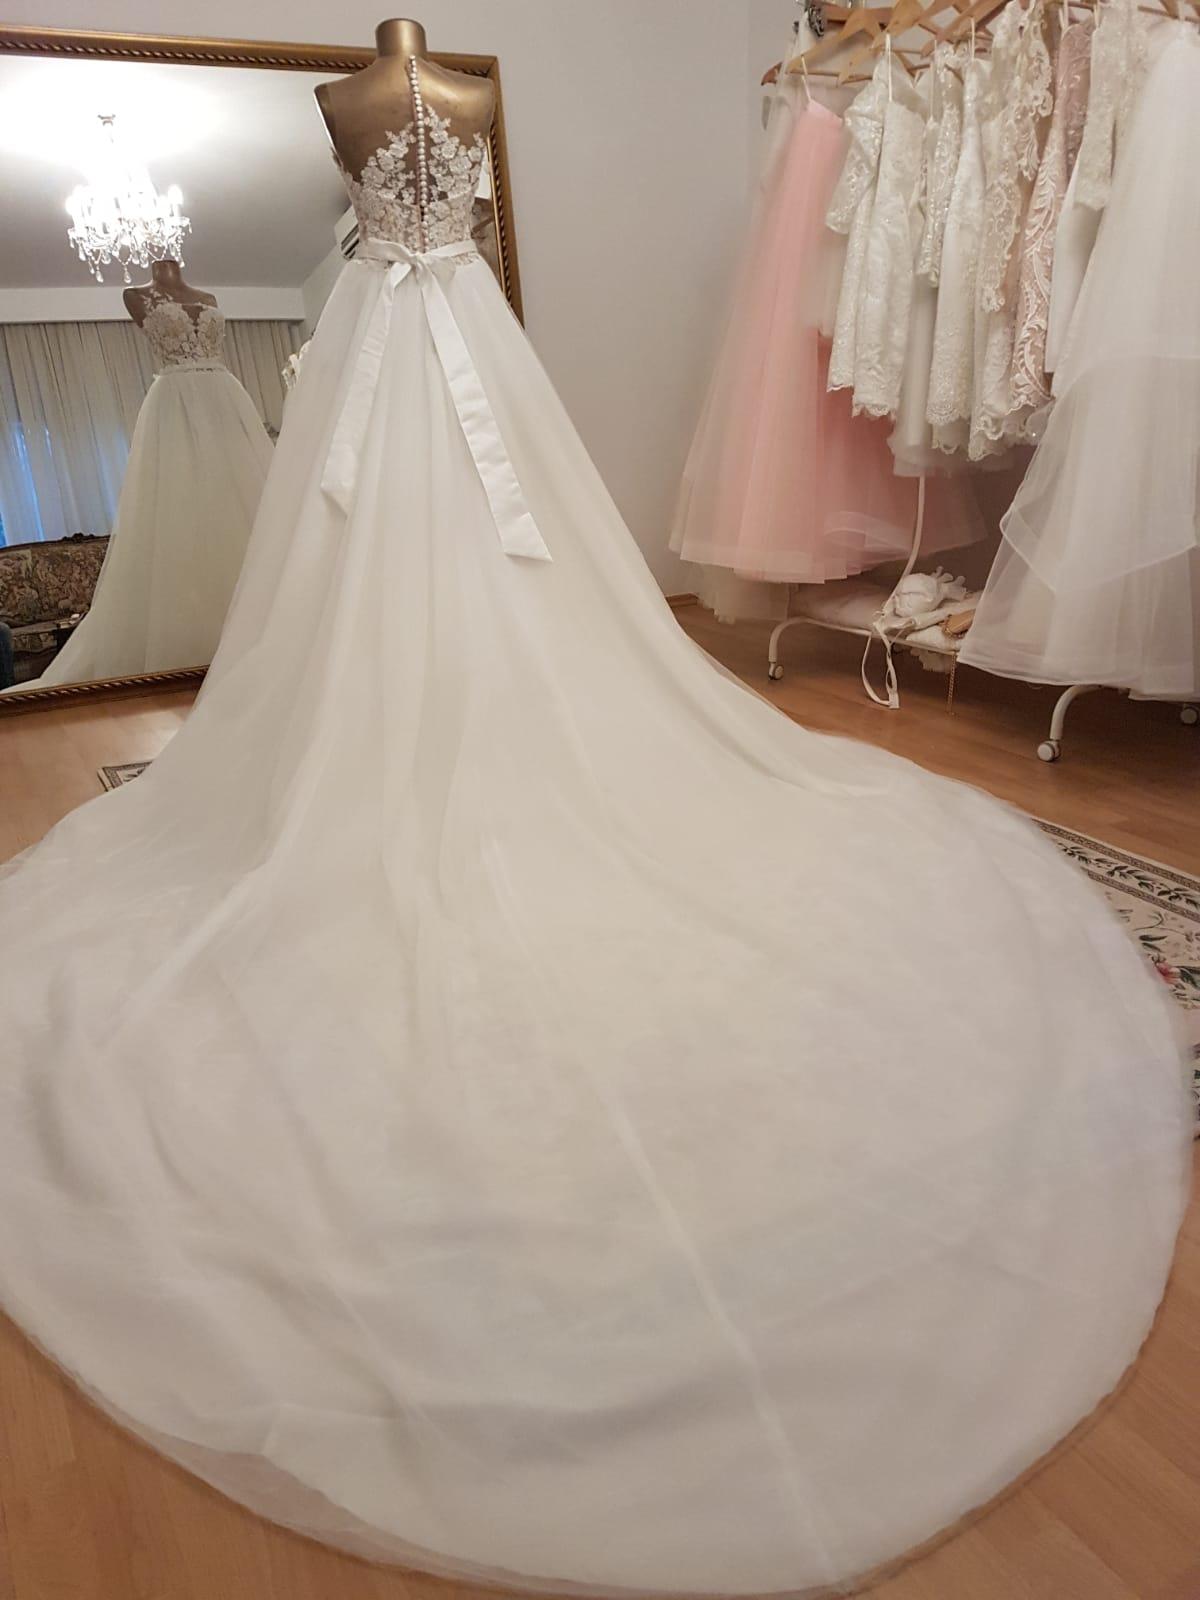 georgiana  rochia de mireasa 5 in 1 (8)